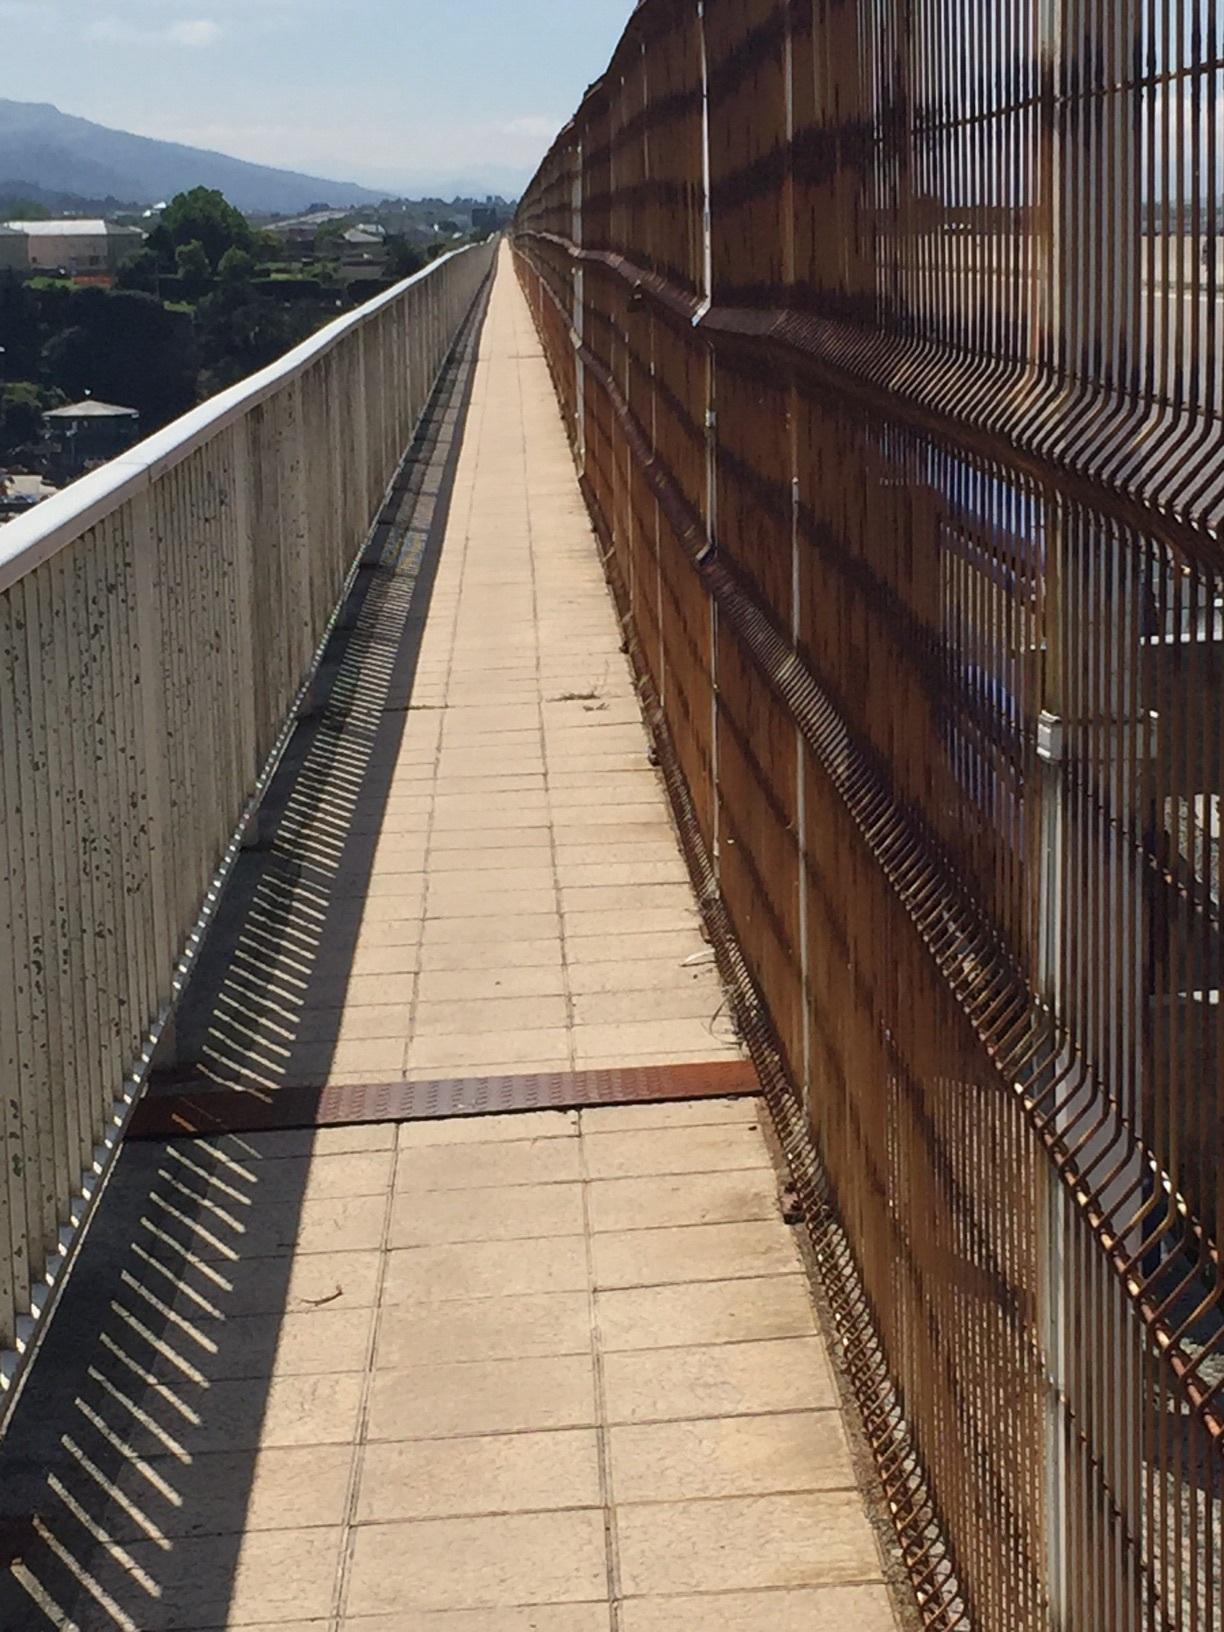 It's a loooong walk across that bridge